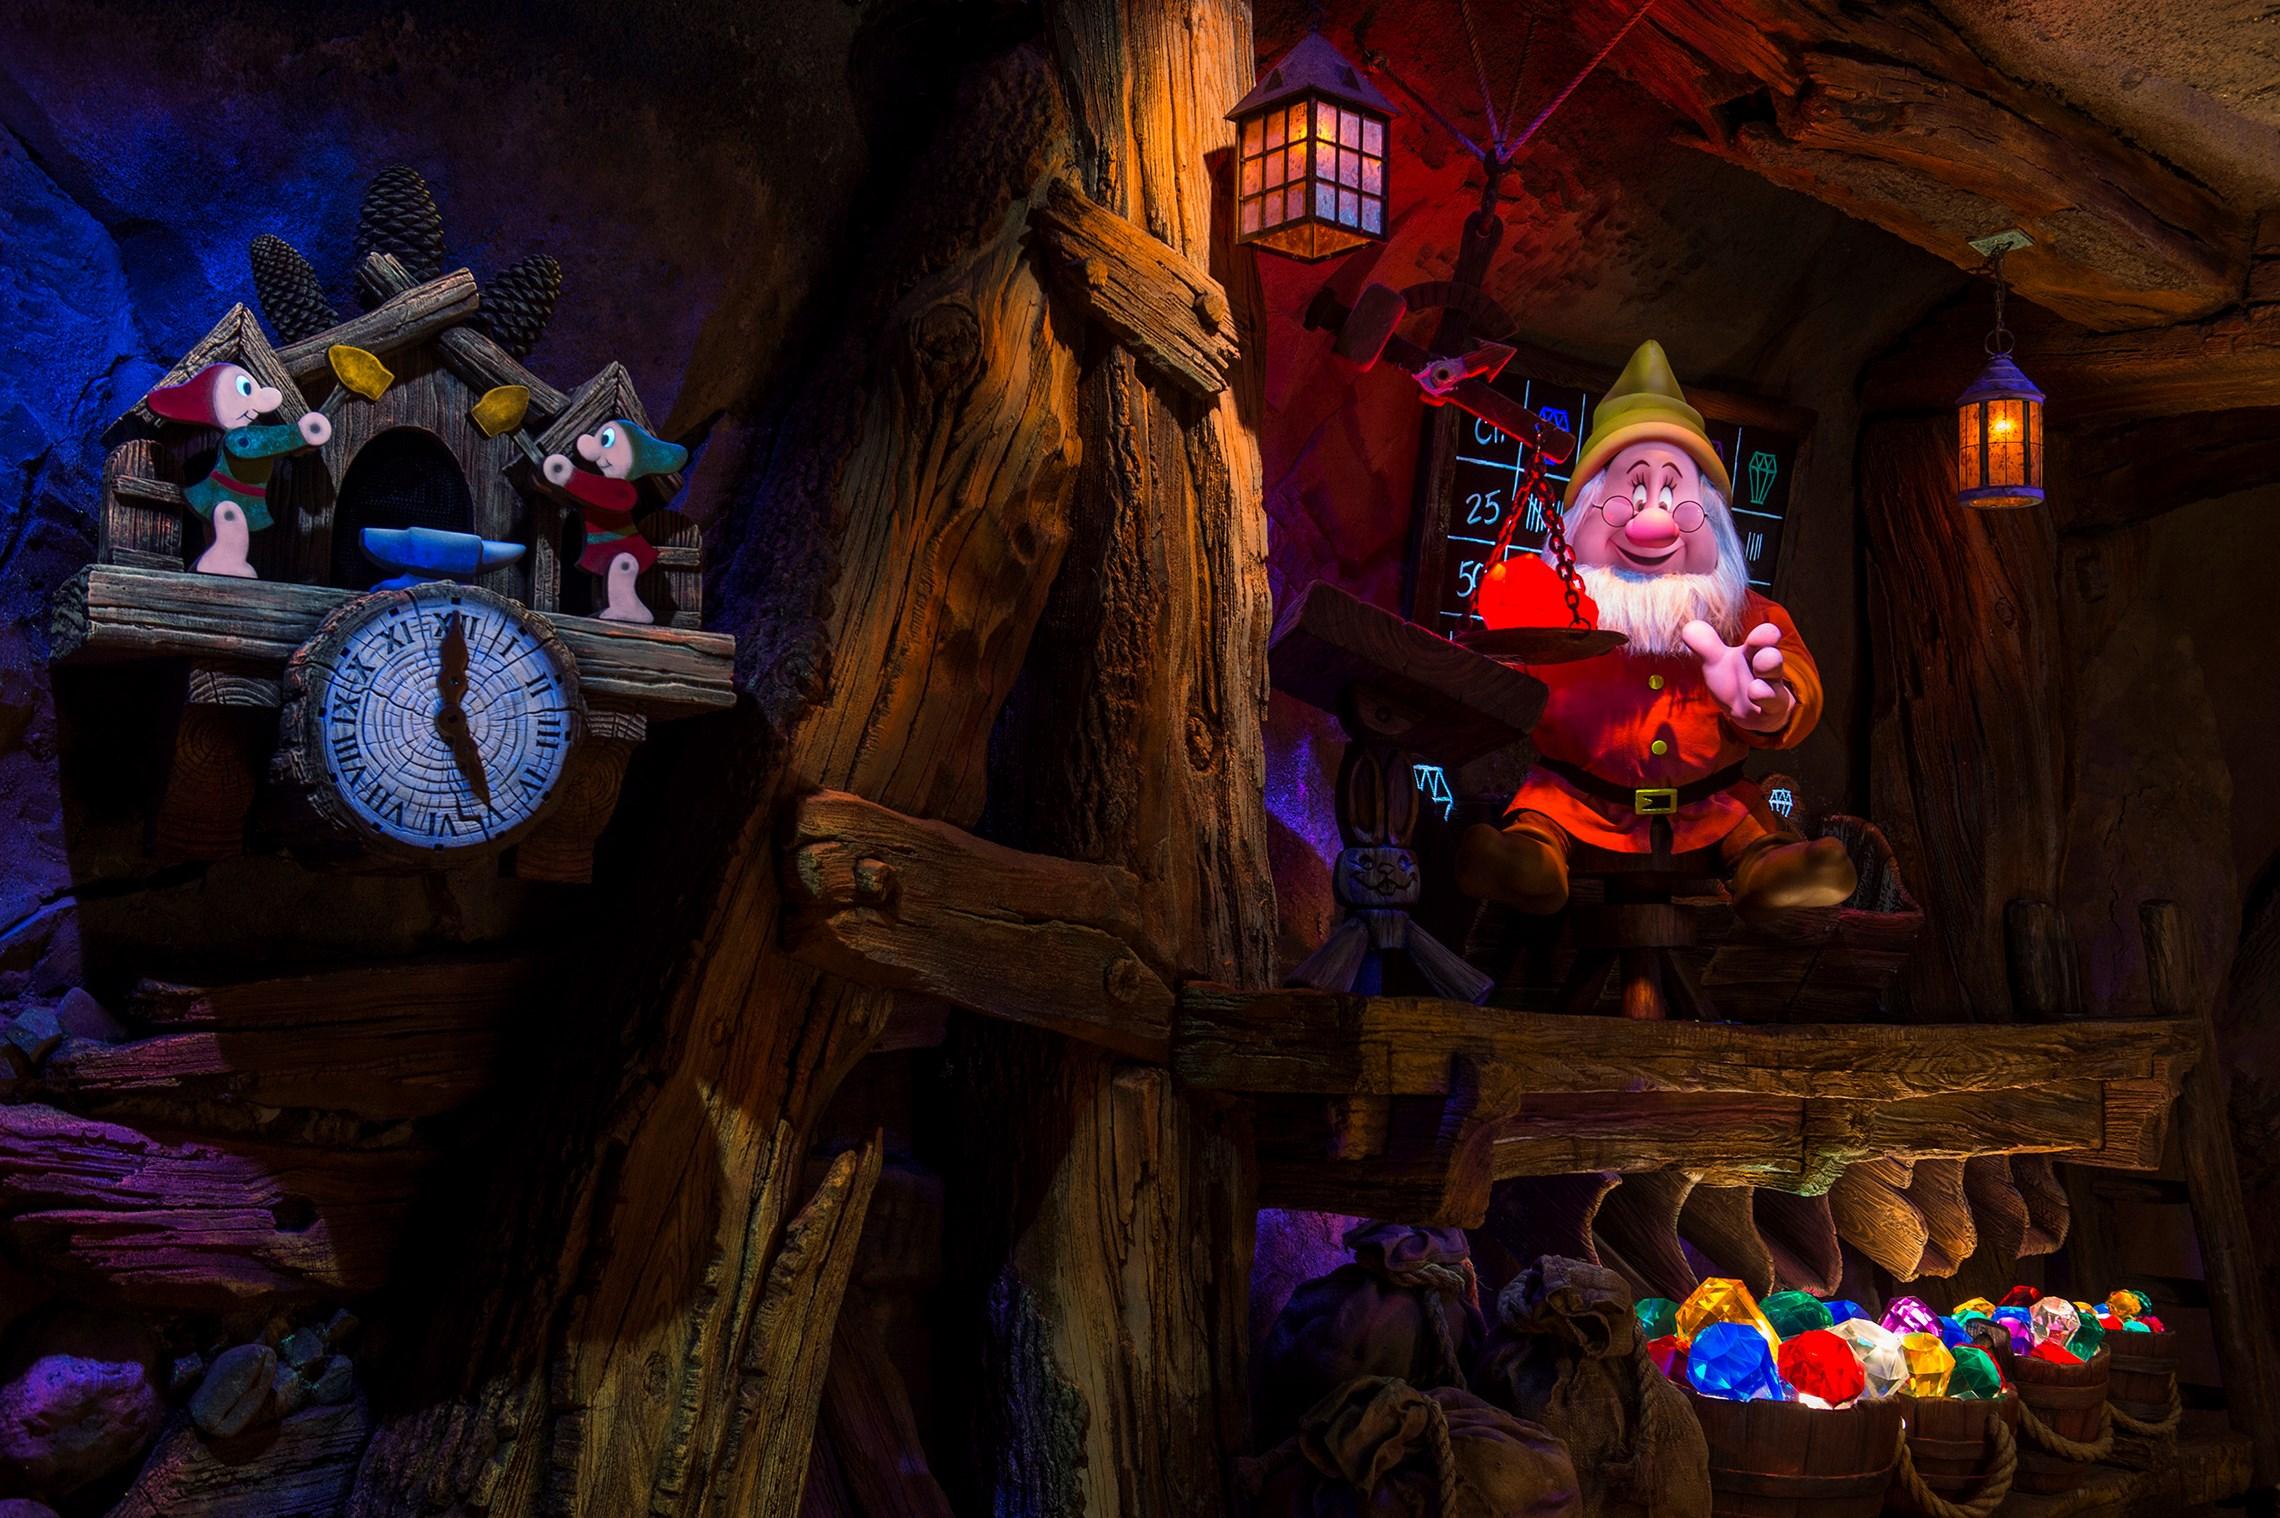 Seven Dwarfs Mine Train audio animatronics